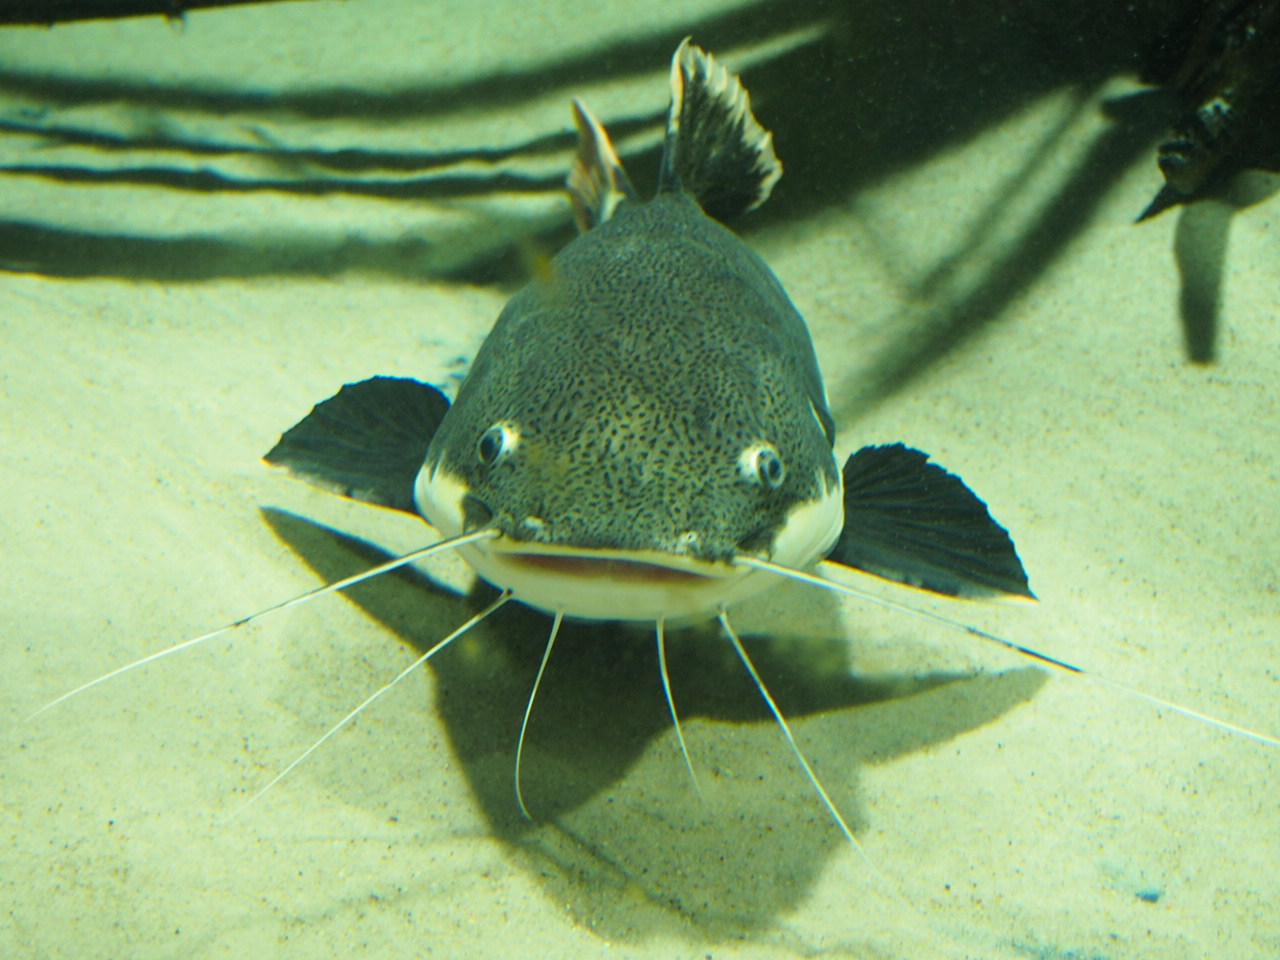 Jedna sumowata ryba w akwarium